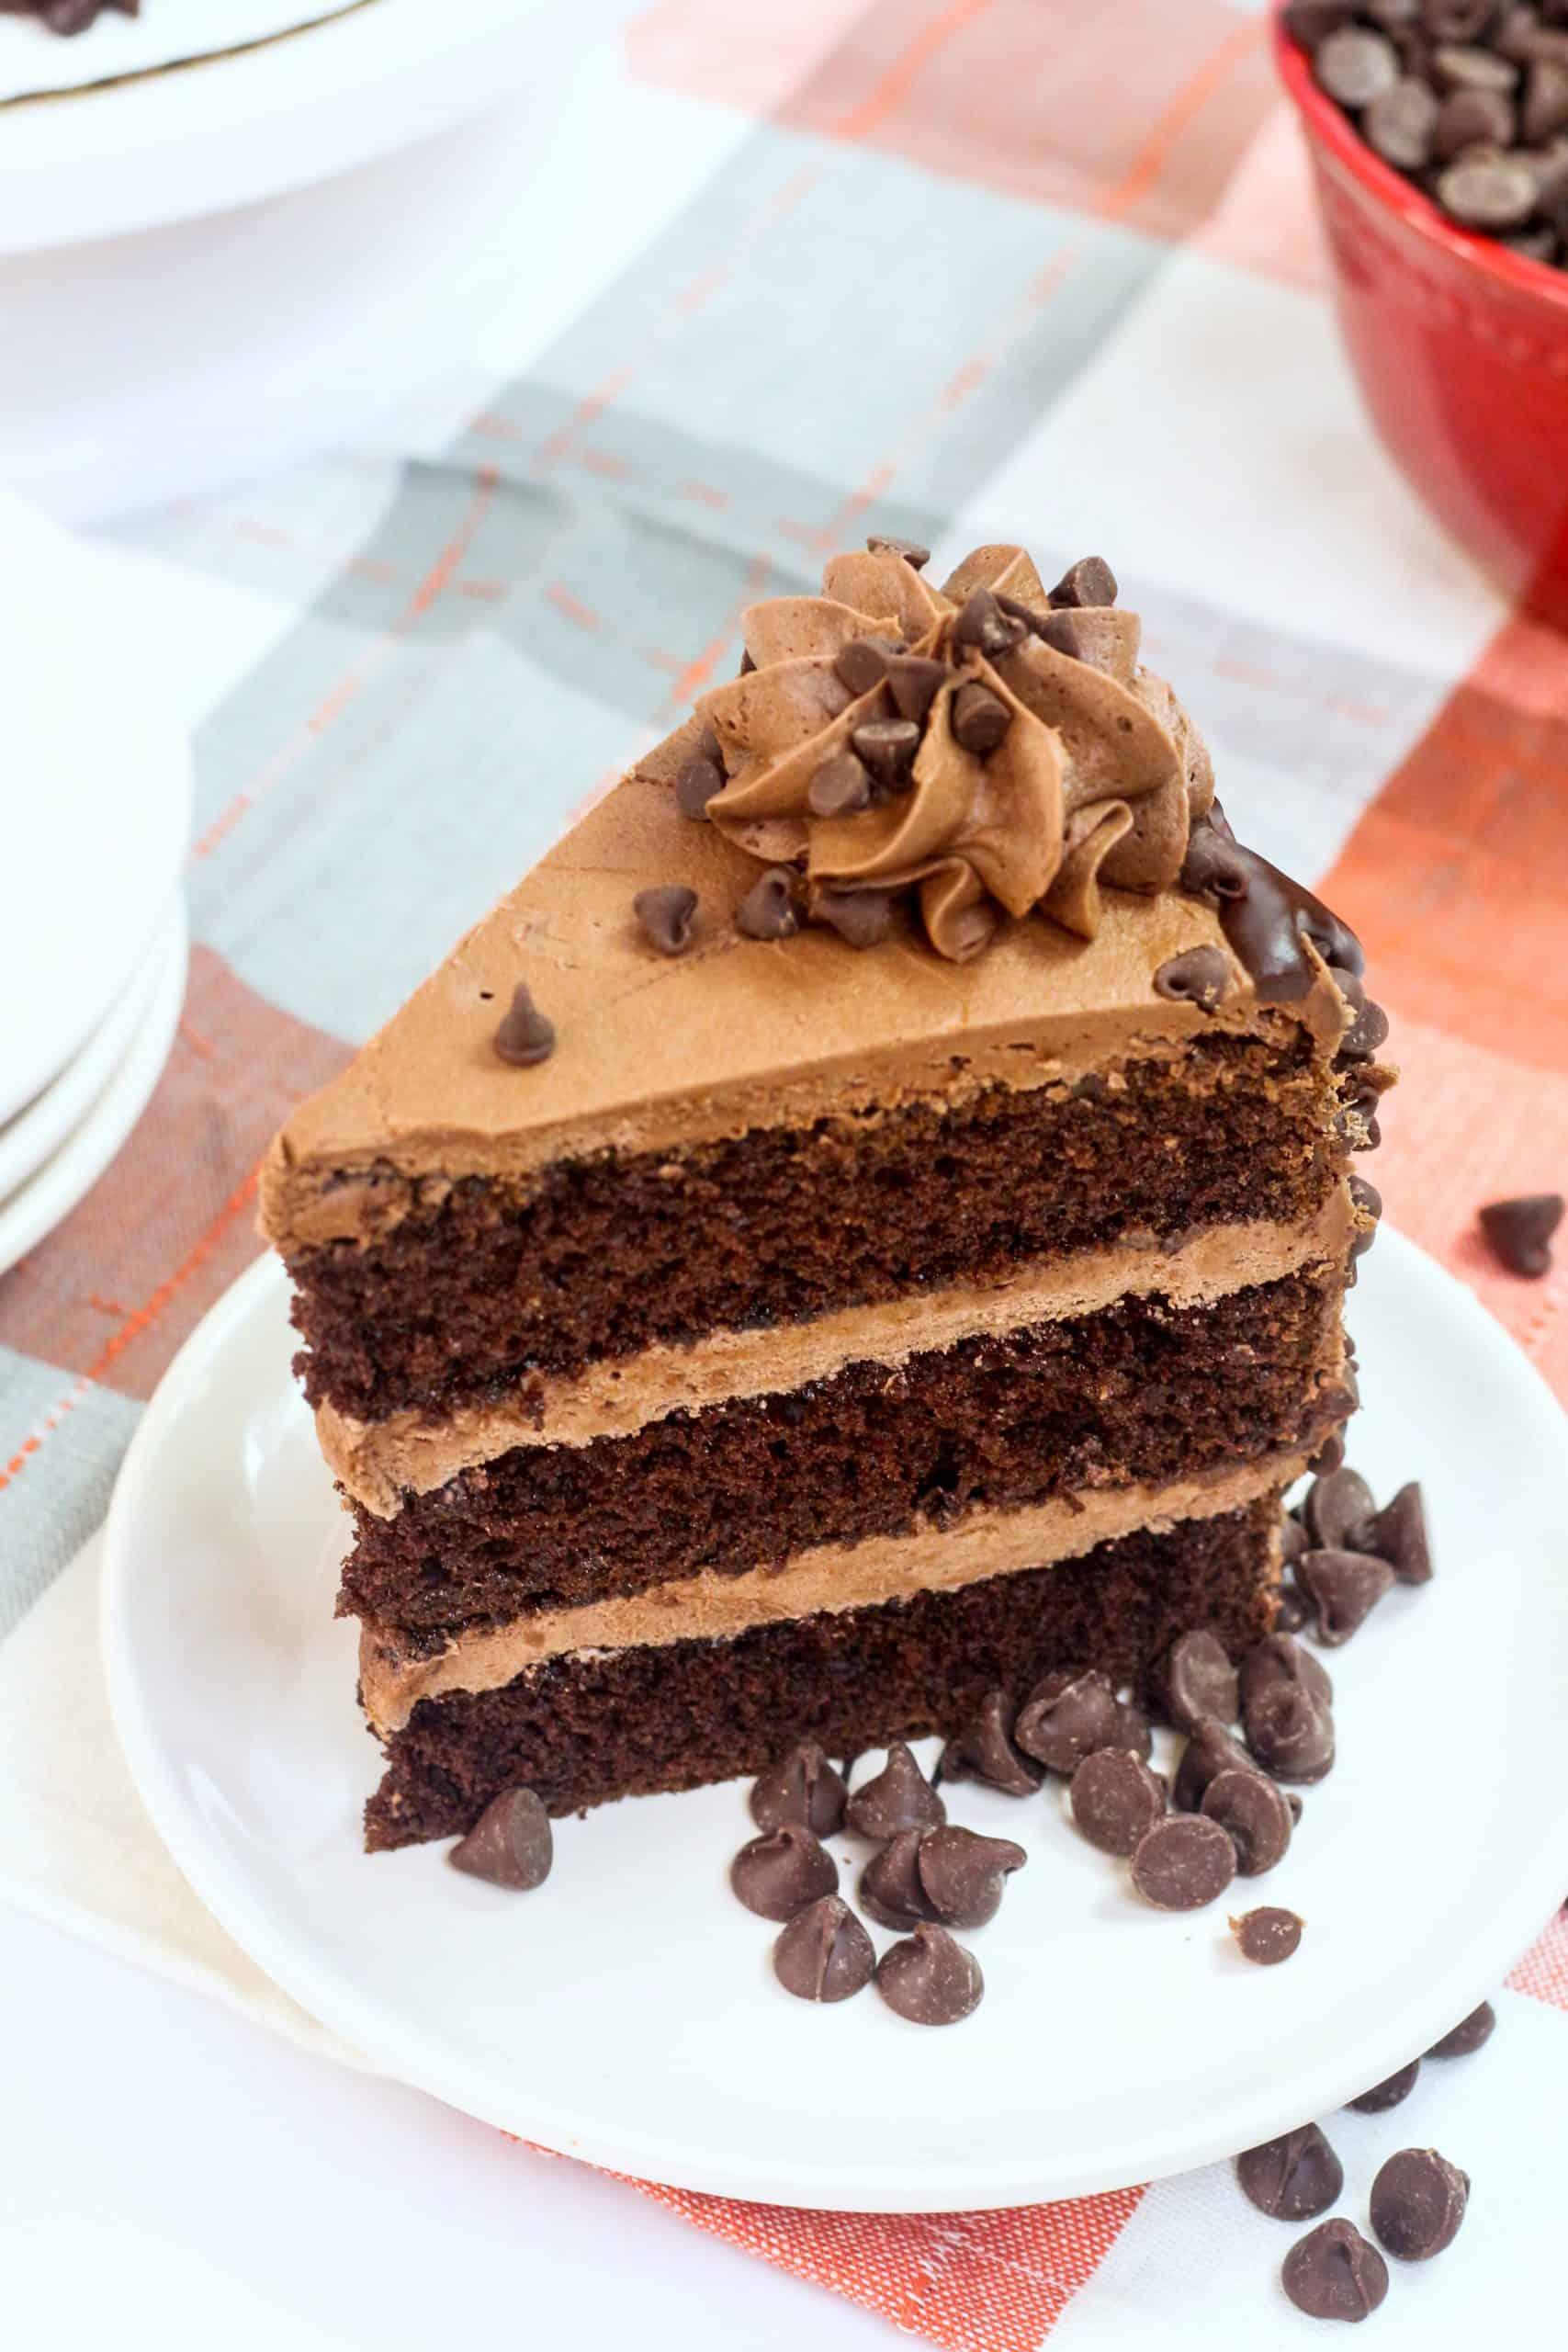 chocolate blackout cake on a plate